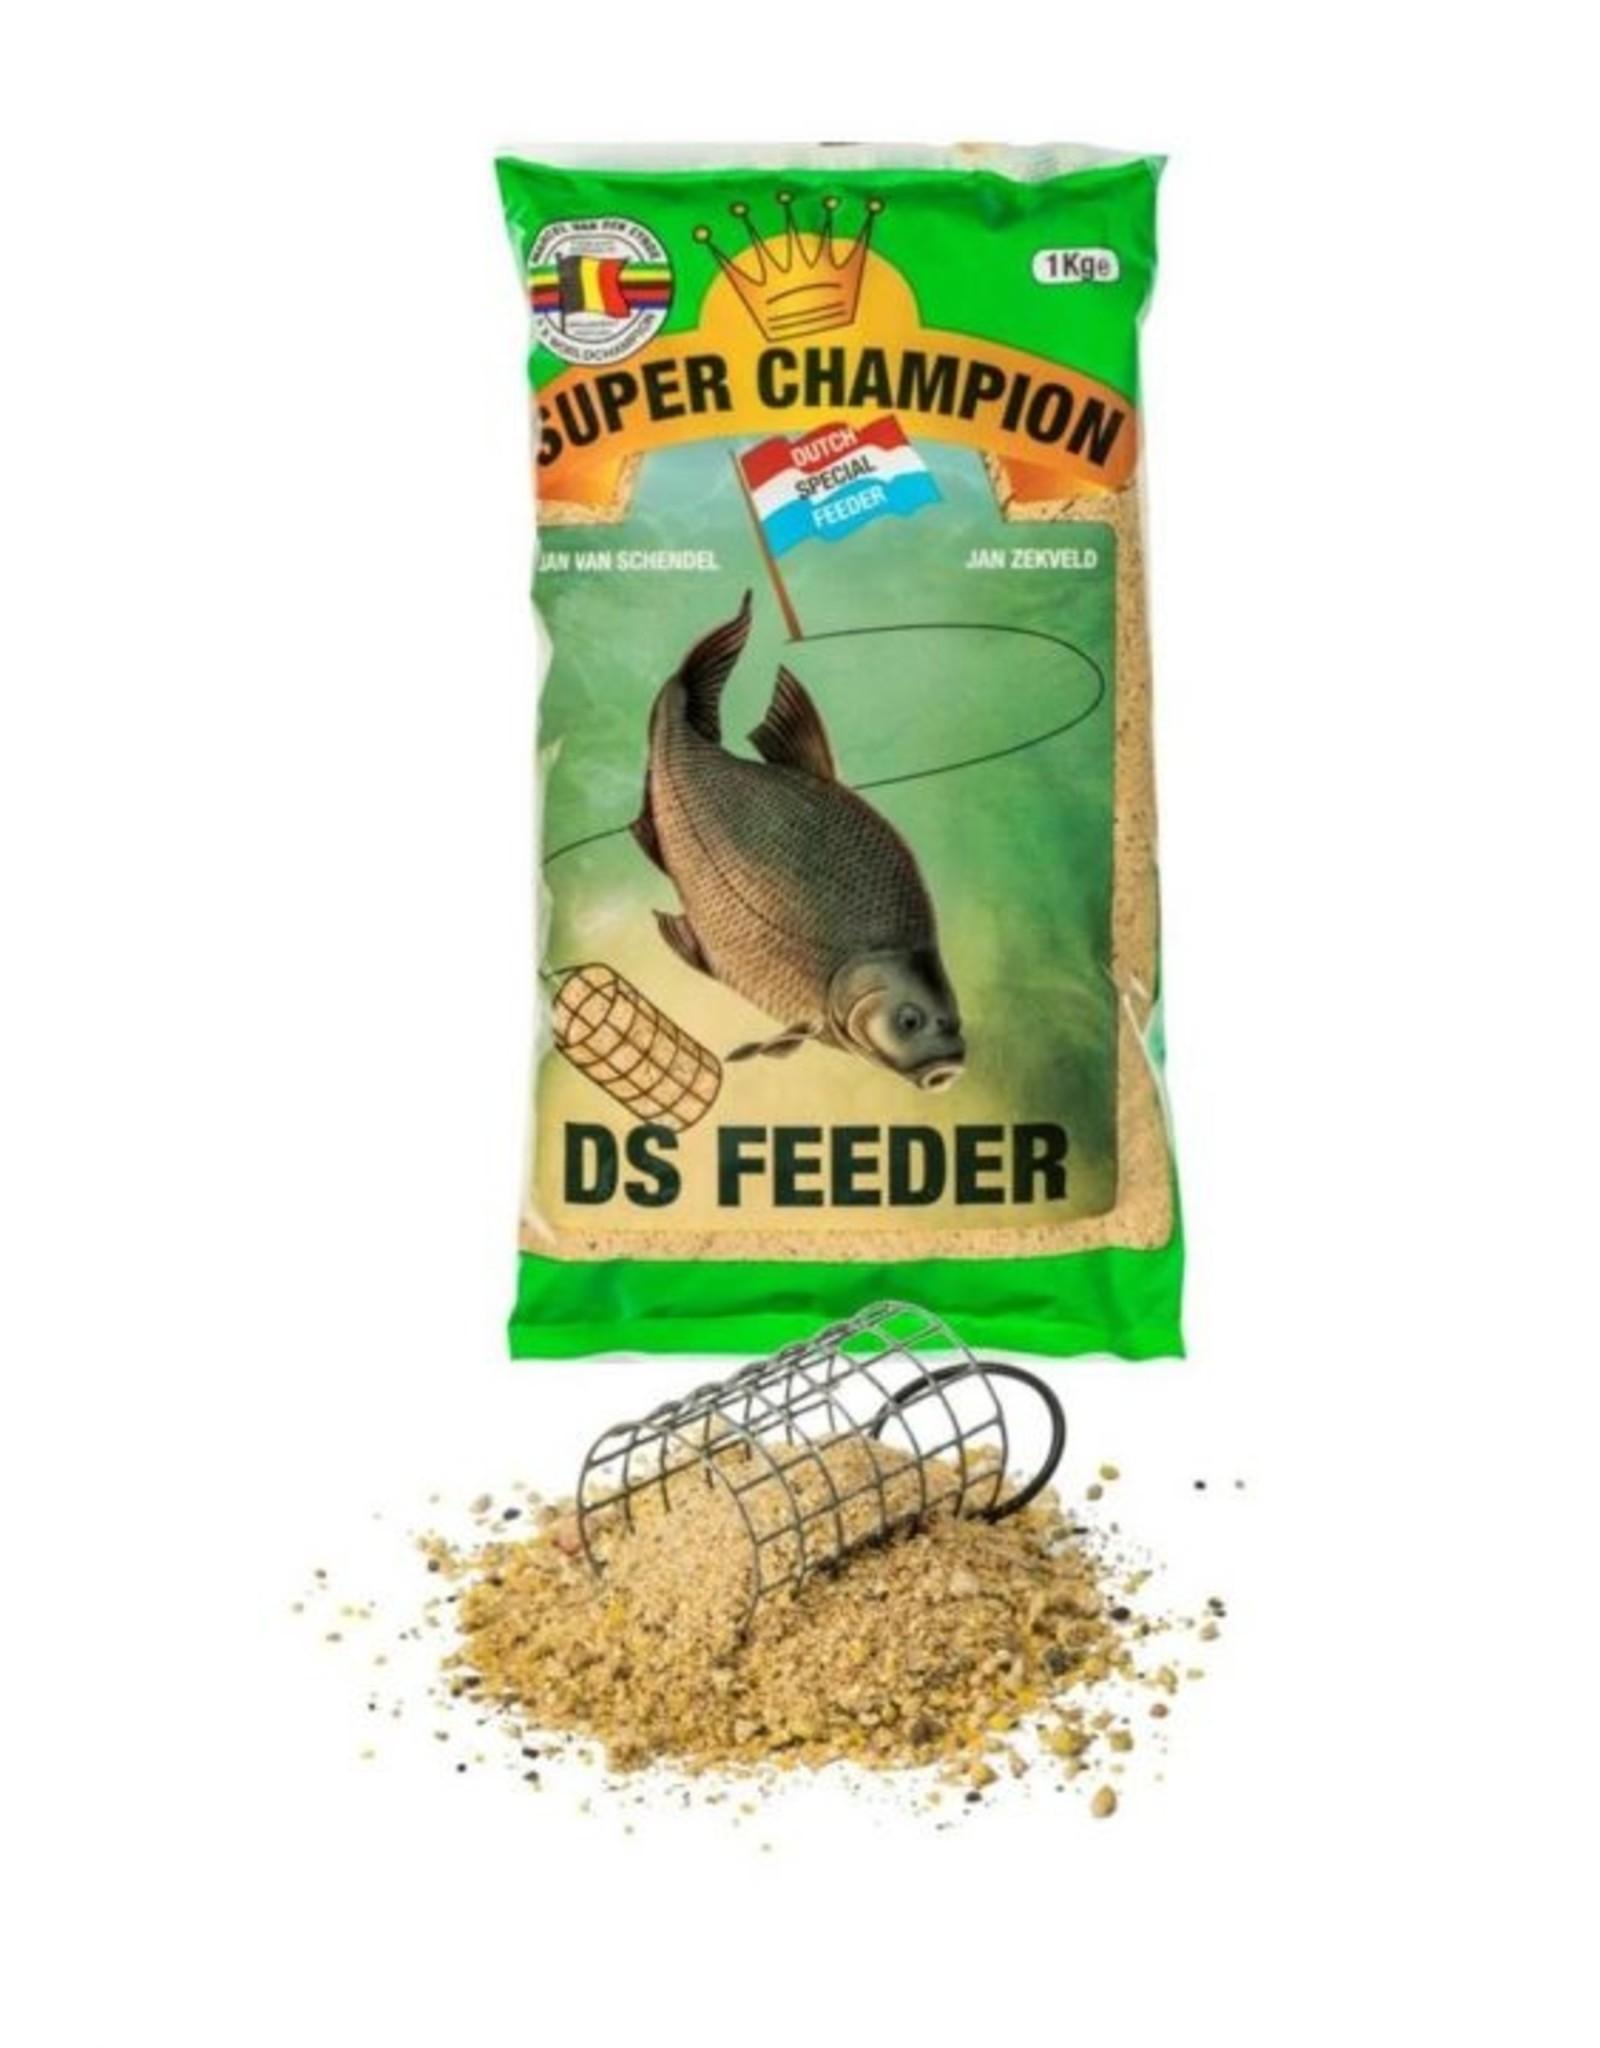 Marcel van de Eynde Van den Eynde Super Champion DS Feeder